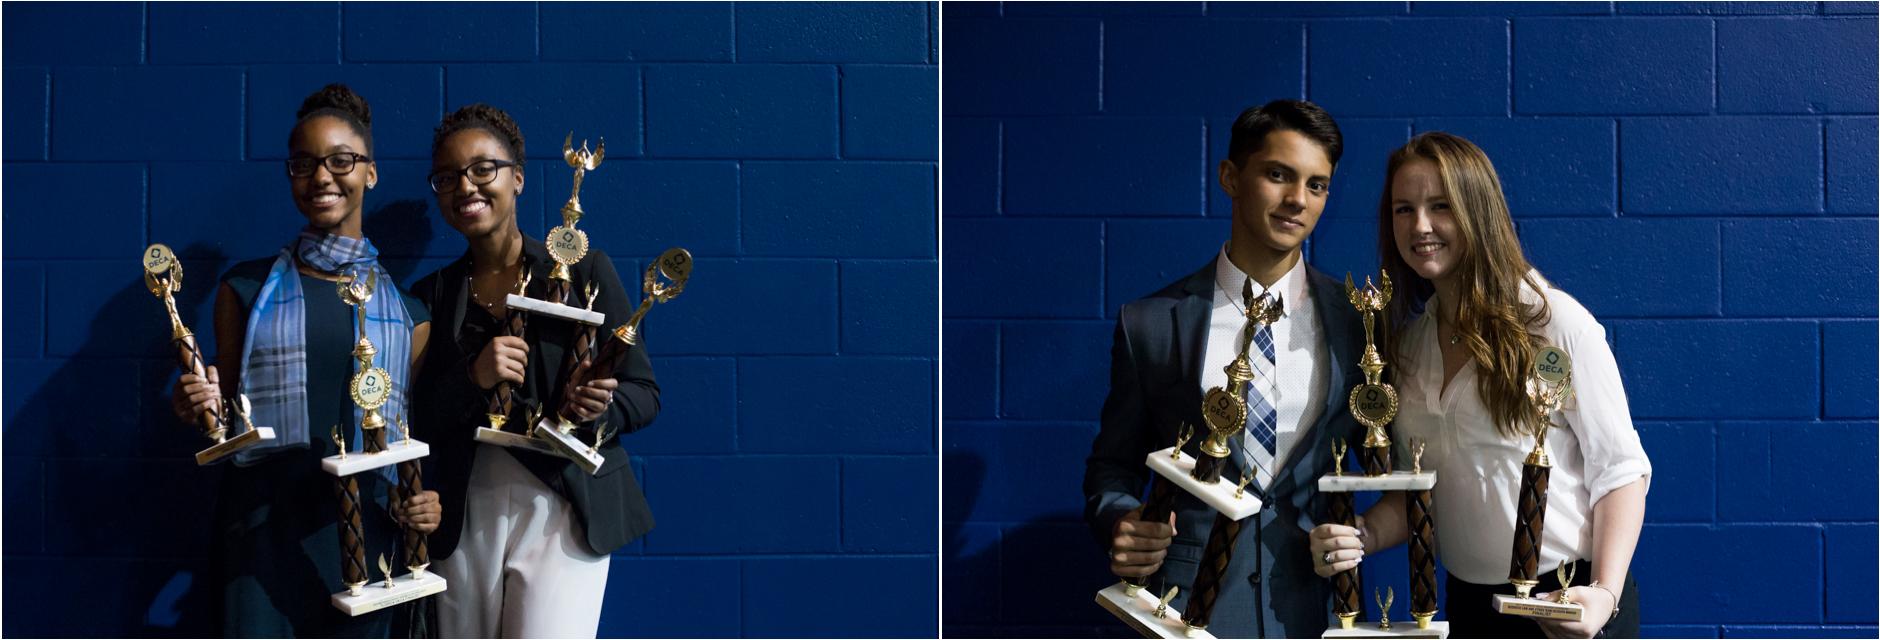 deca blue wall portraits.jpg